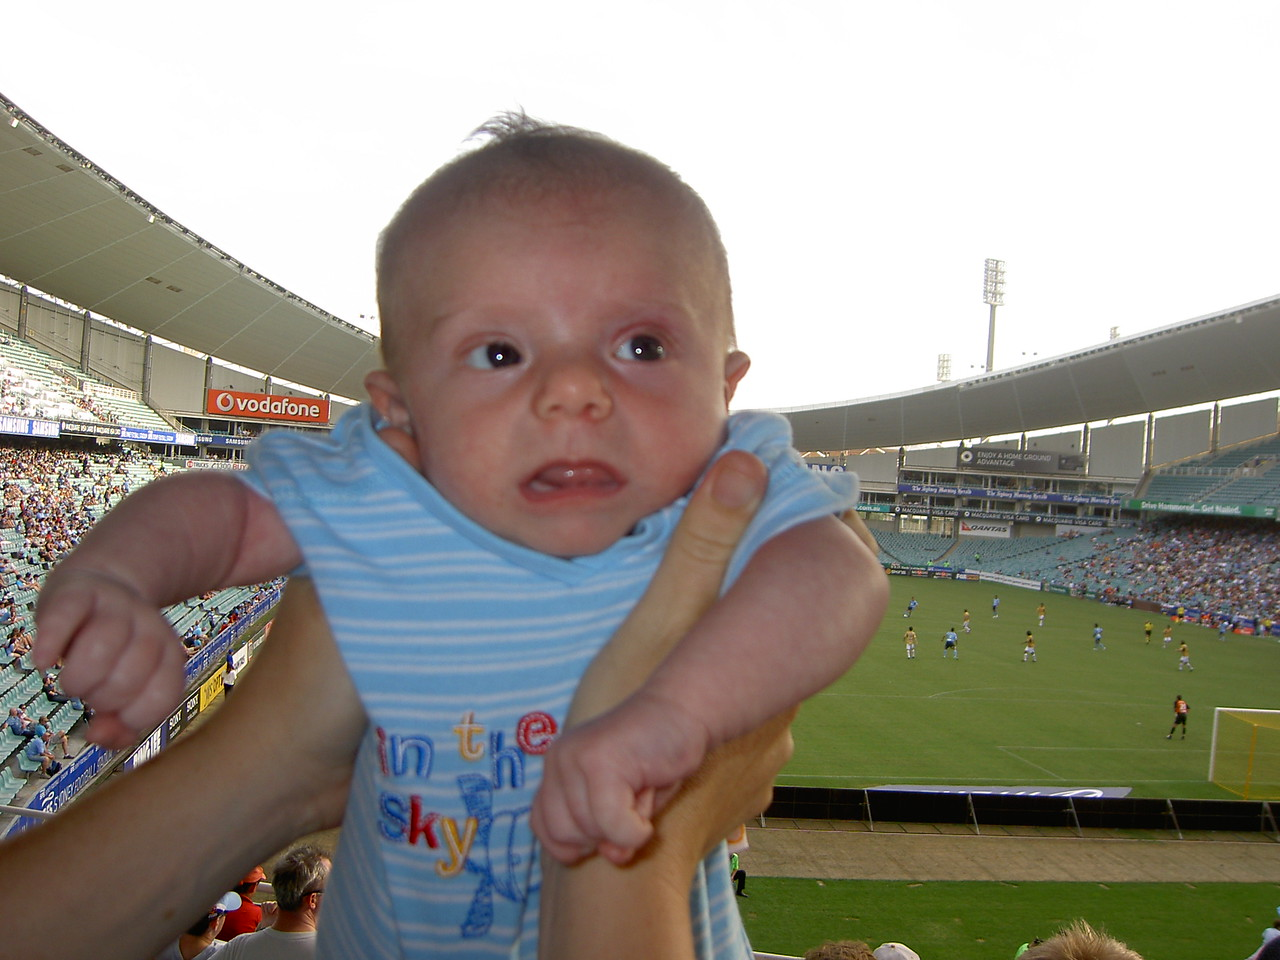 Sydney FC vs Newcastle